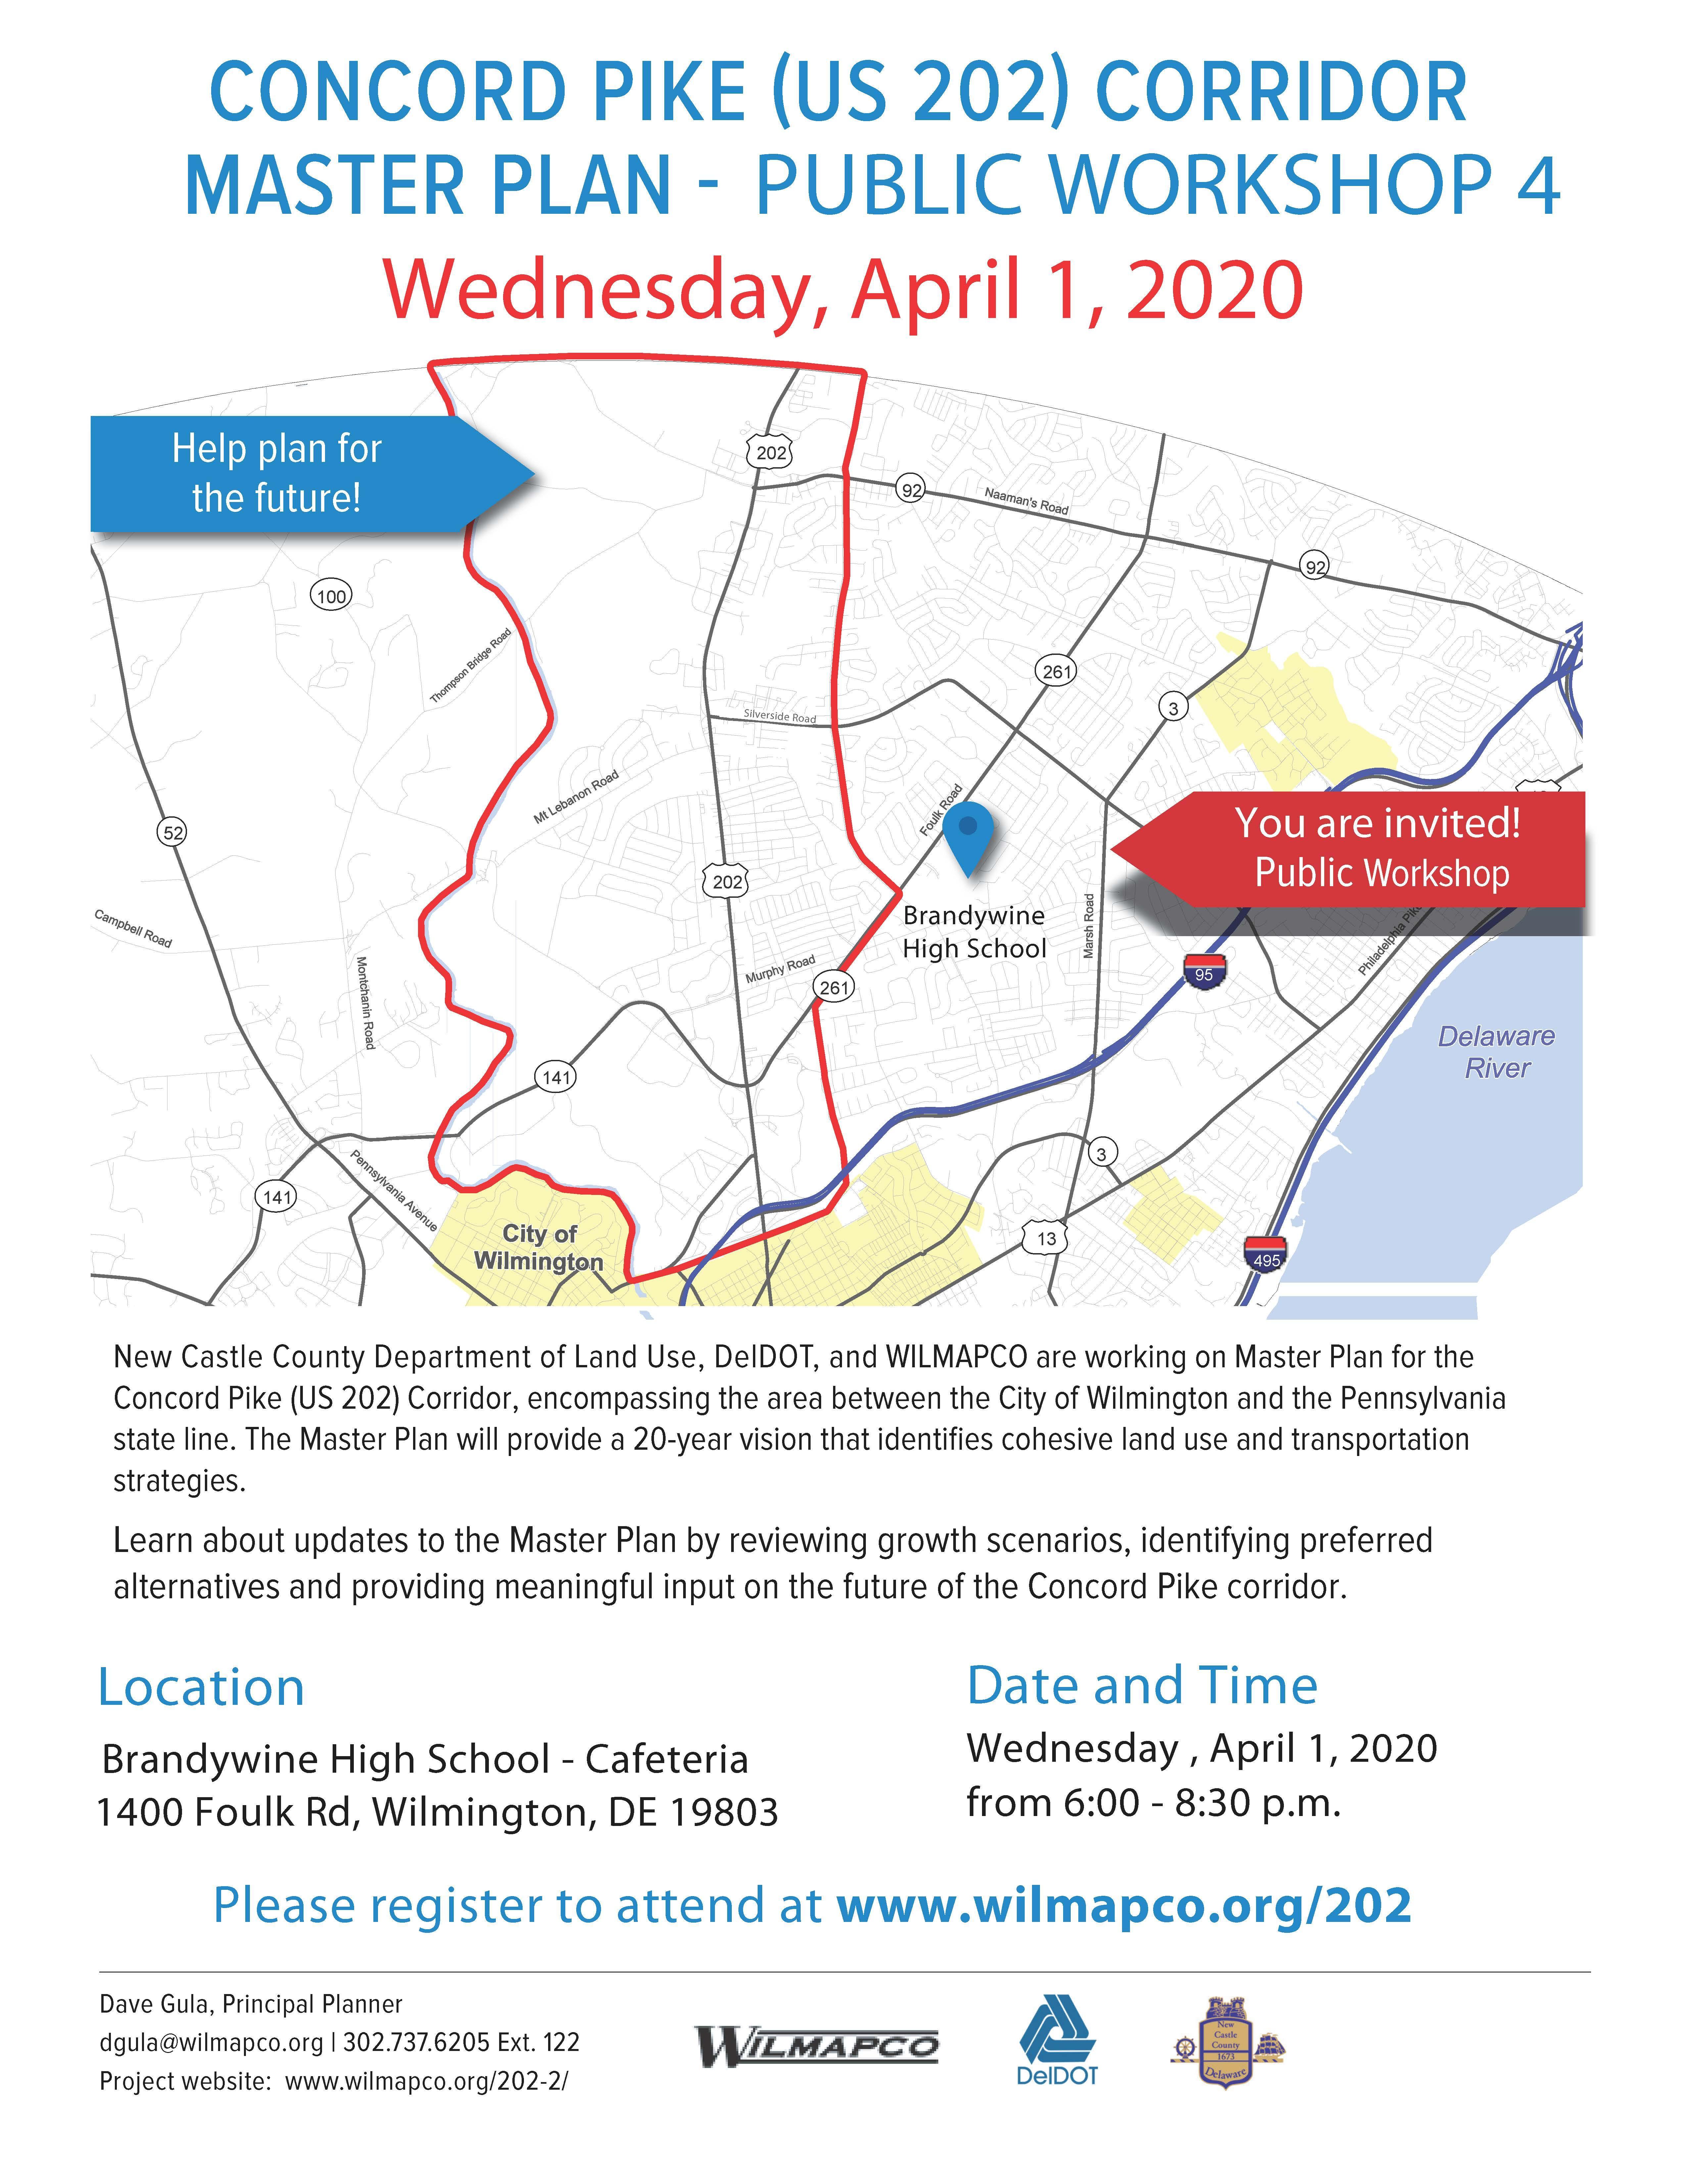 Concord Pike Master Plan Public Workshop